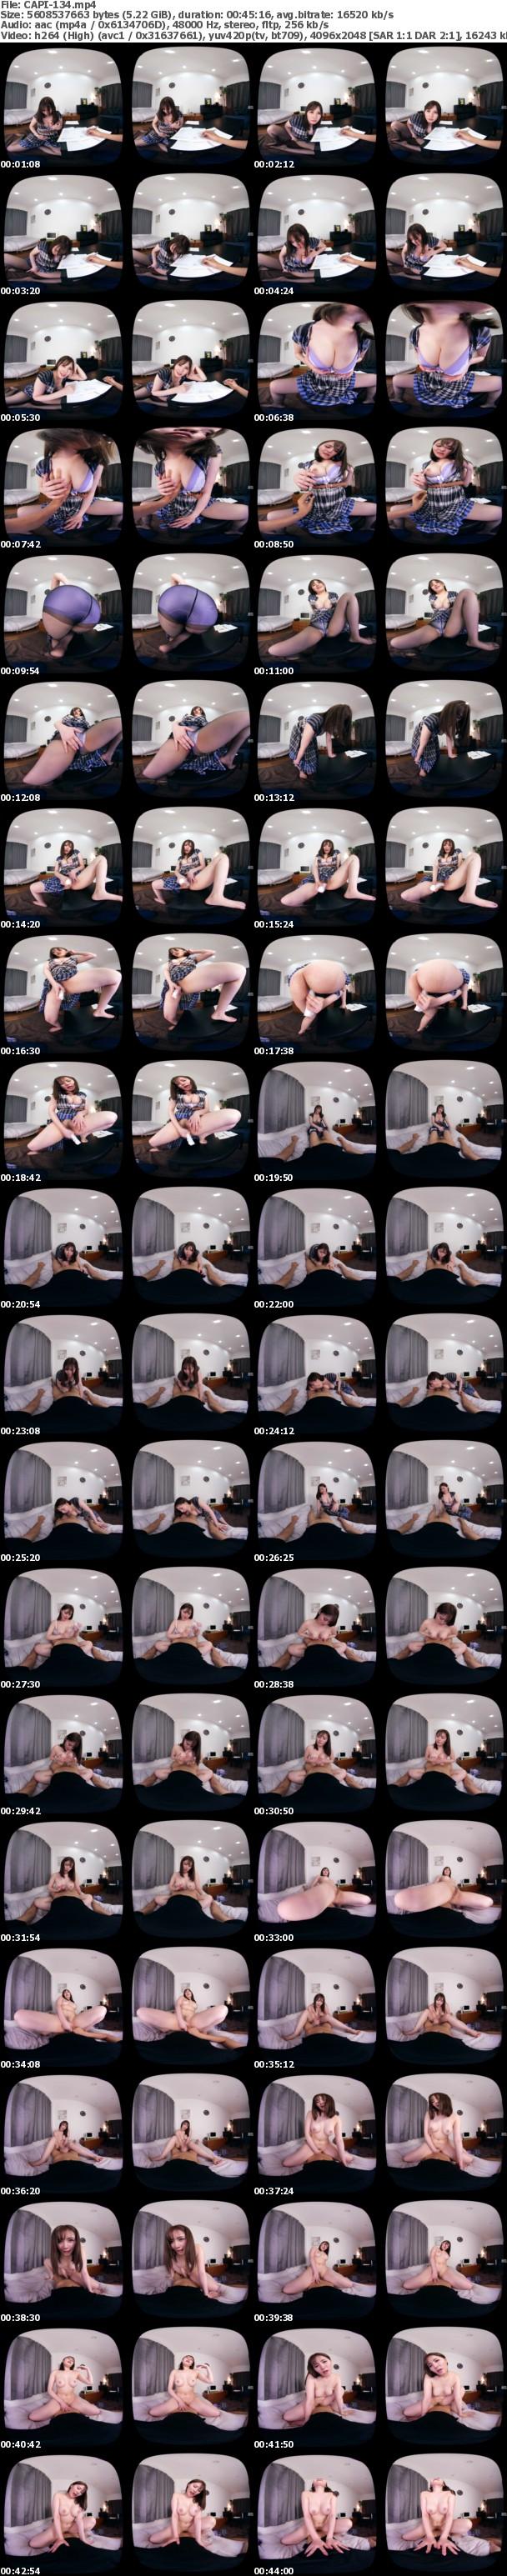 (VR) CAPI-134 超ド迫力映像!Gカップ痴女家庭教師の悩殺性教育がとてつもなく卑猥。藤白桃羽